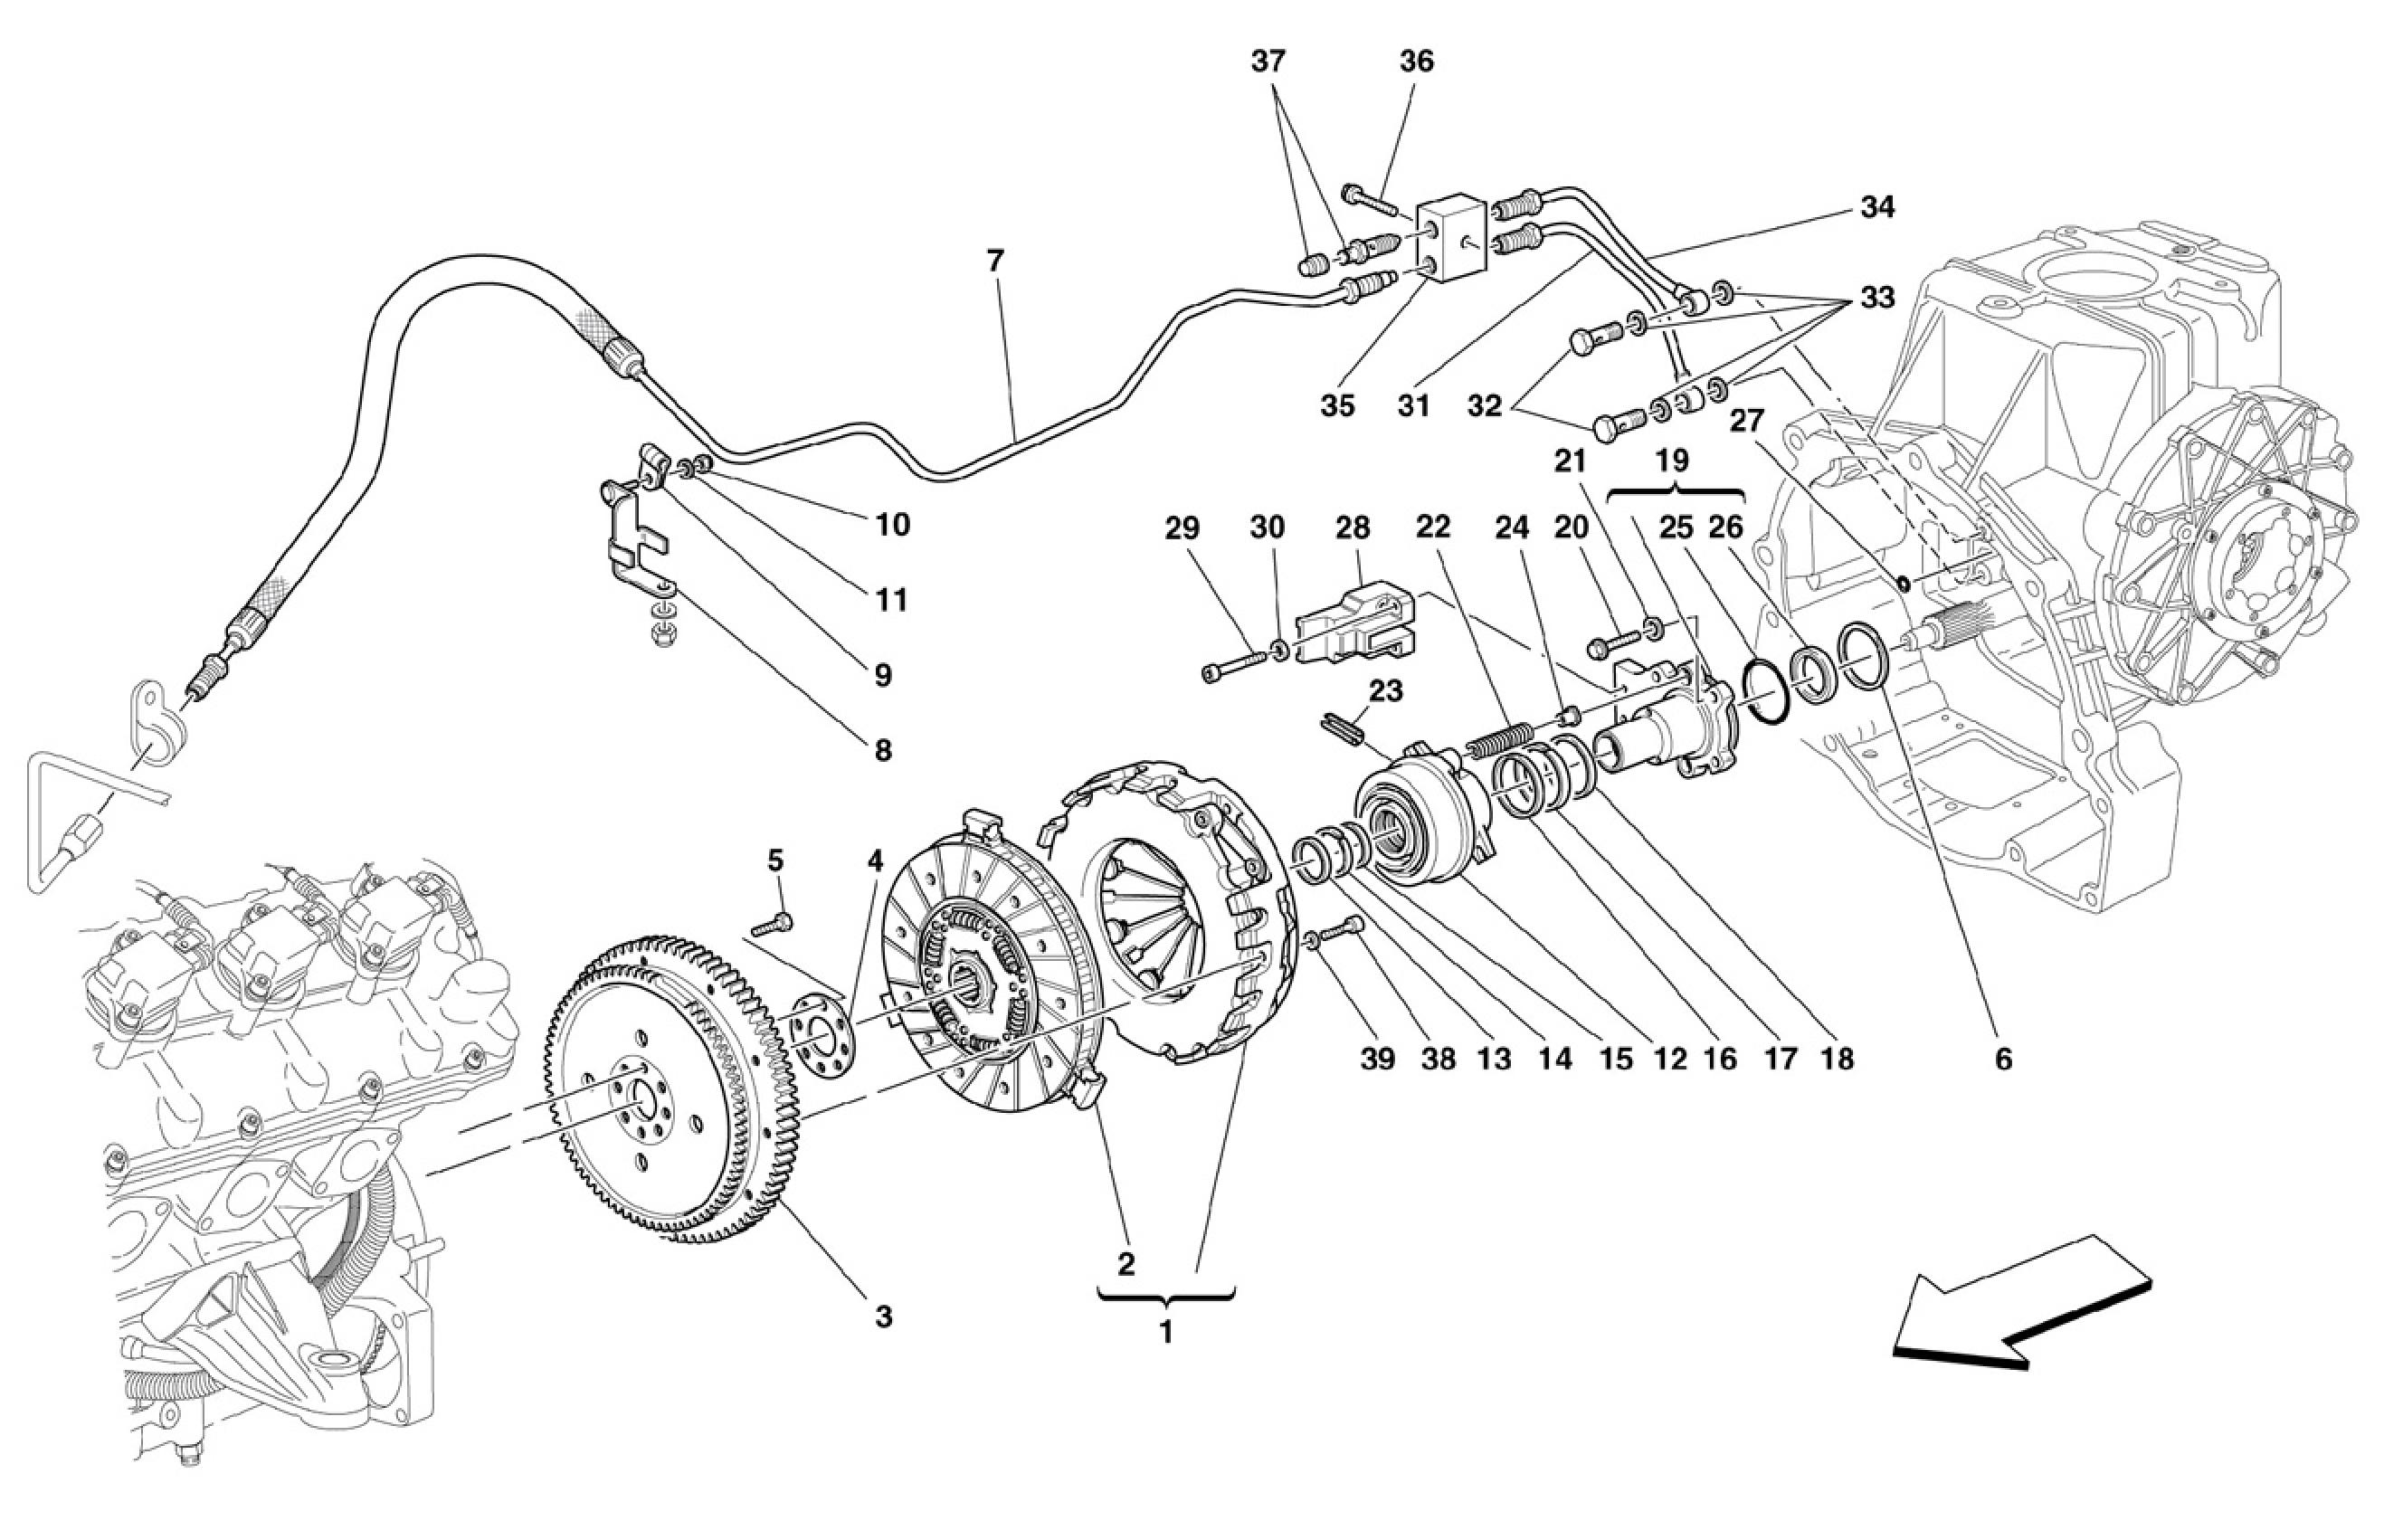 Ferrari F430 05 08 Clutch And Controls Not For F1